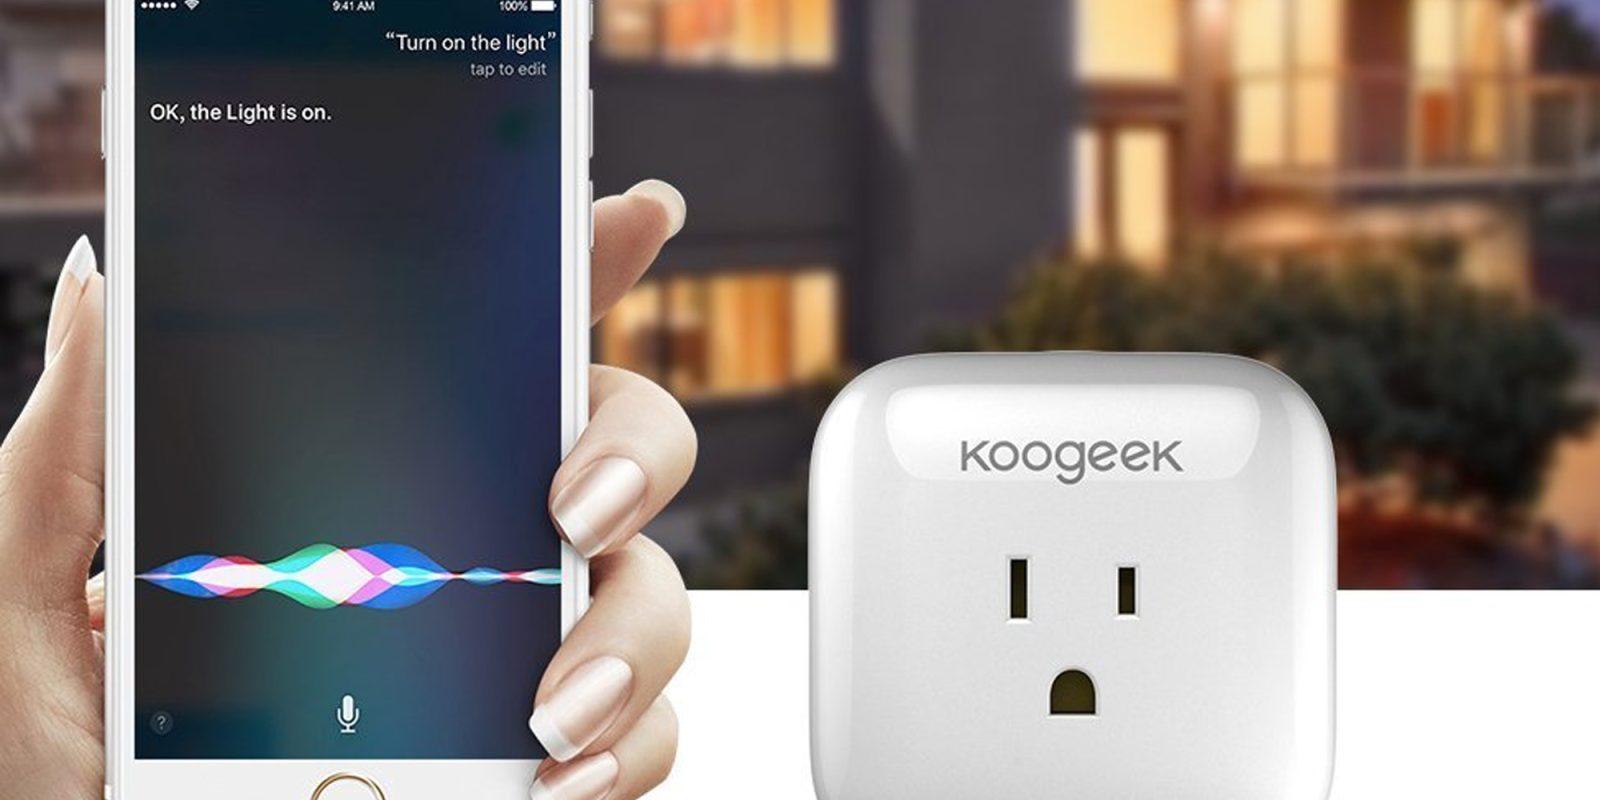 Koogeek Smart Plug for Apple HomeKit $21 Prime shipped - 9to5Toys